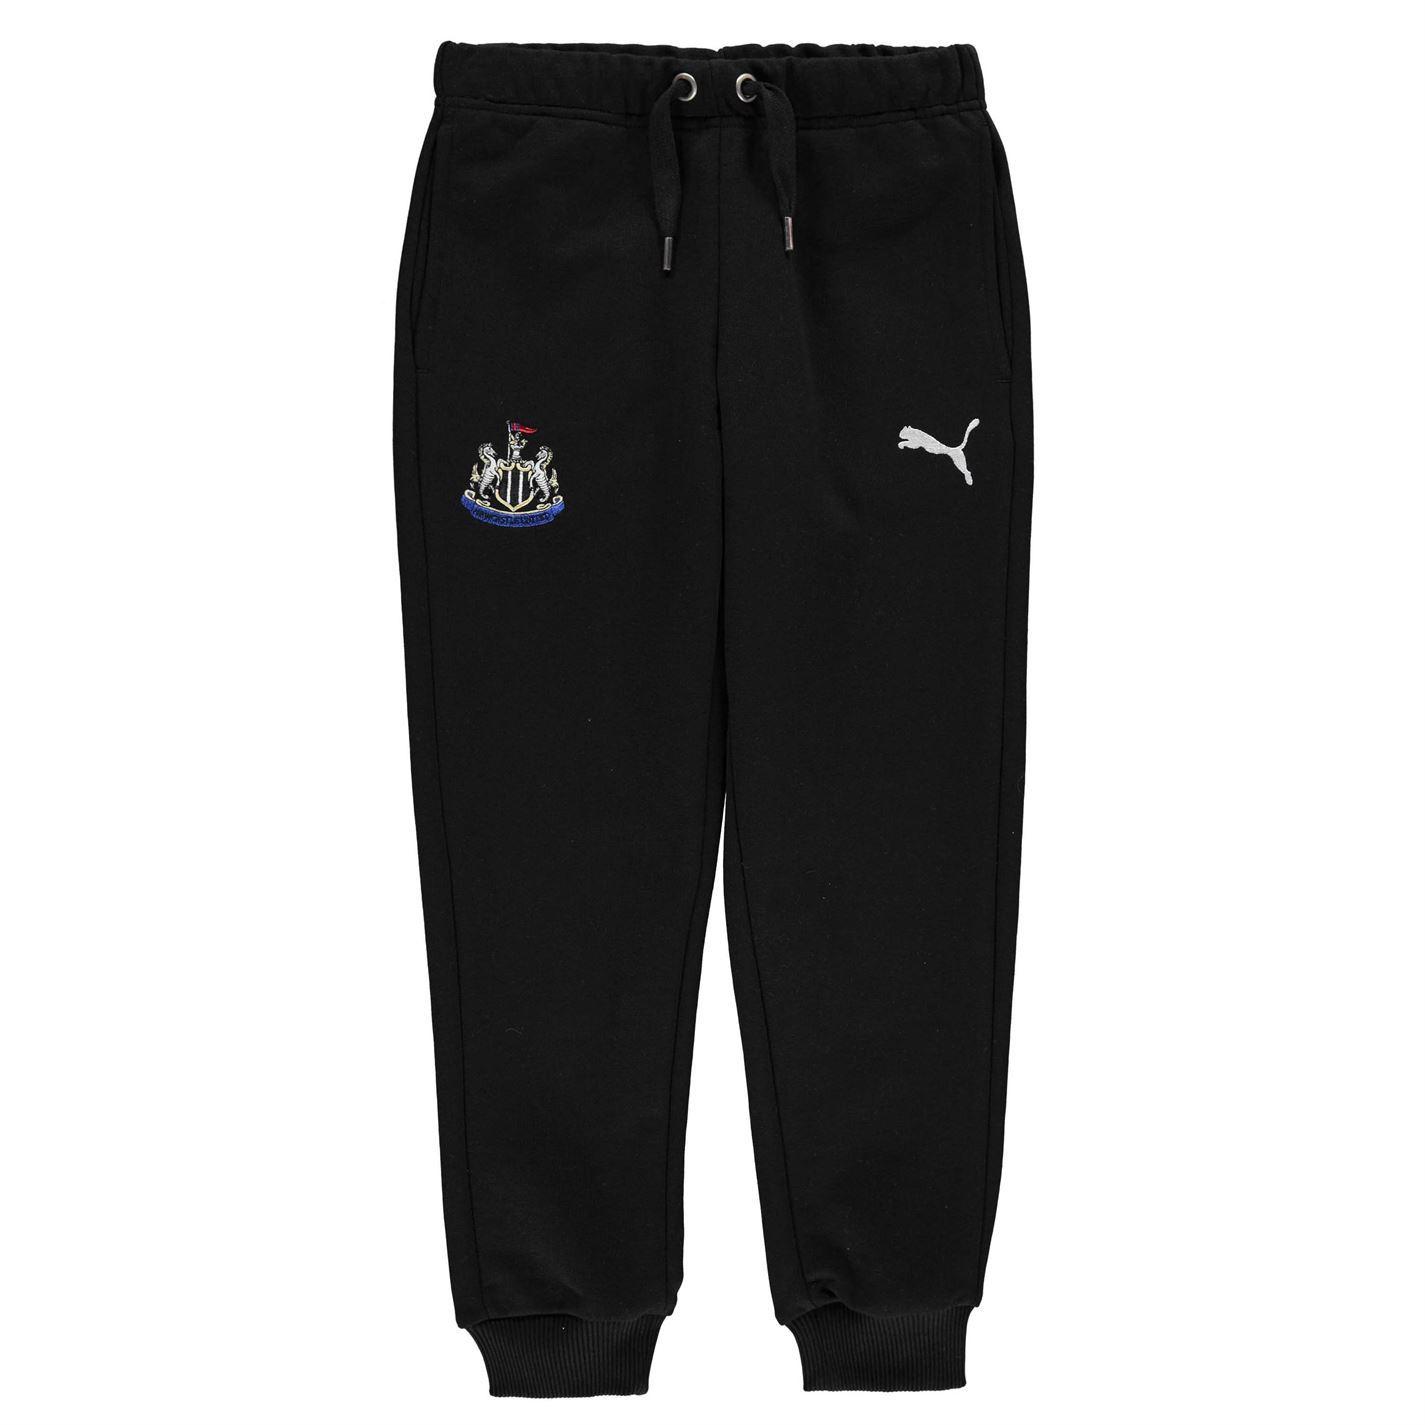 909cf4ba0a82 ... Puma Newcastle United Sweat Pants Juniors Football Soccer Track Sweat  Bottoms